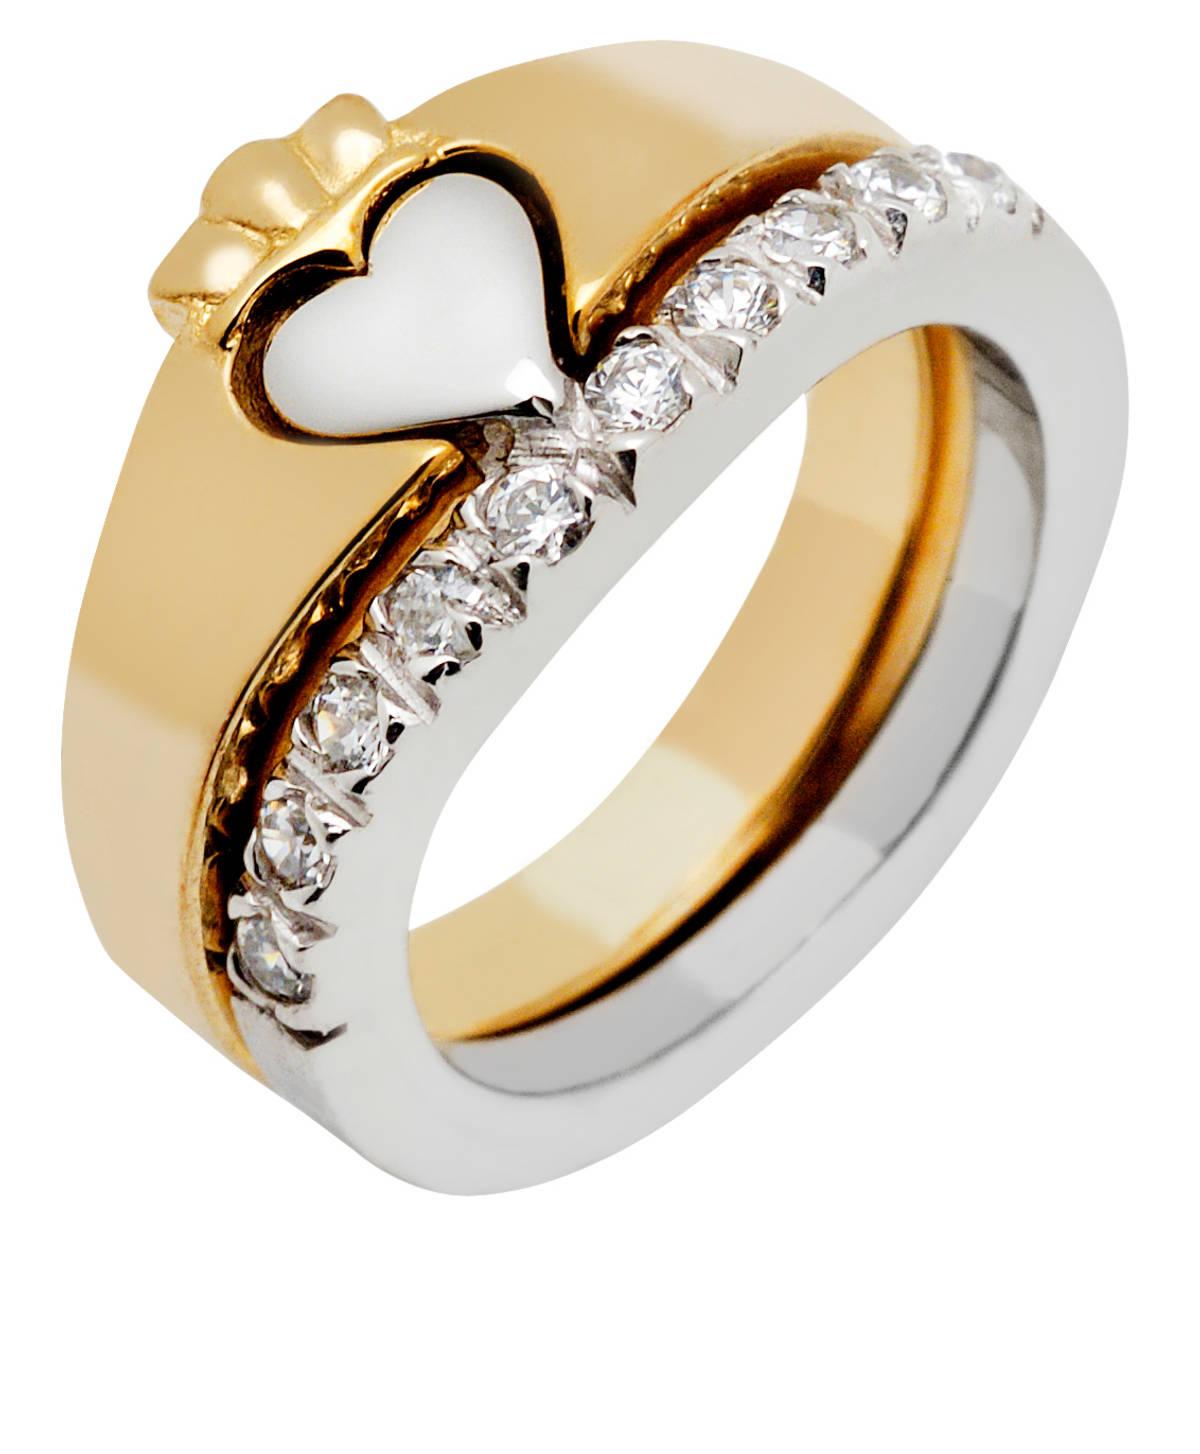 10 carat gold 2-part CZ Claddagh ring set